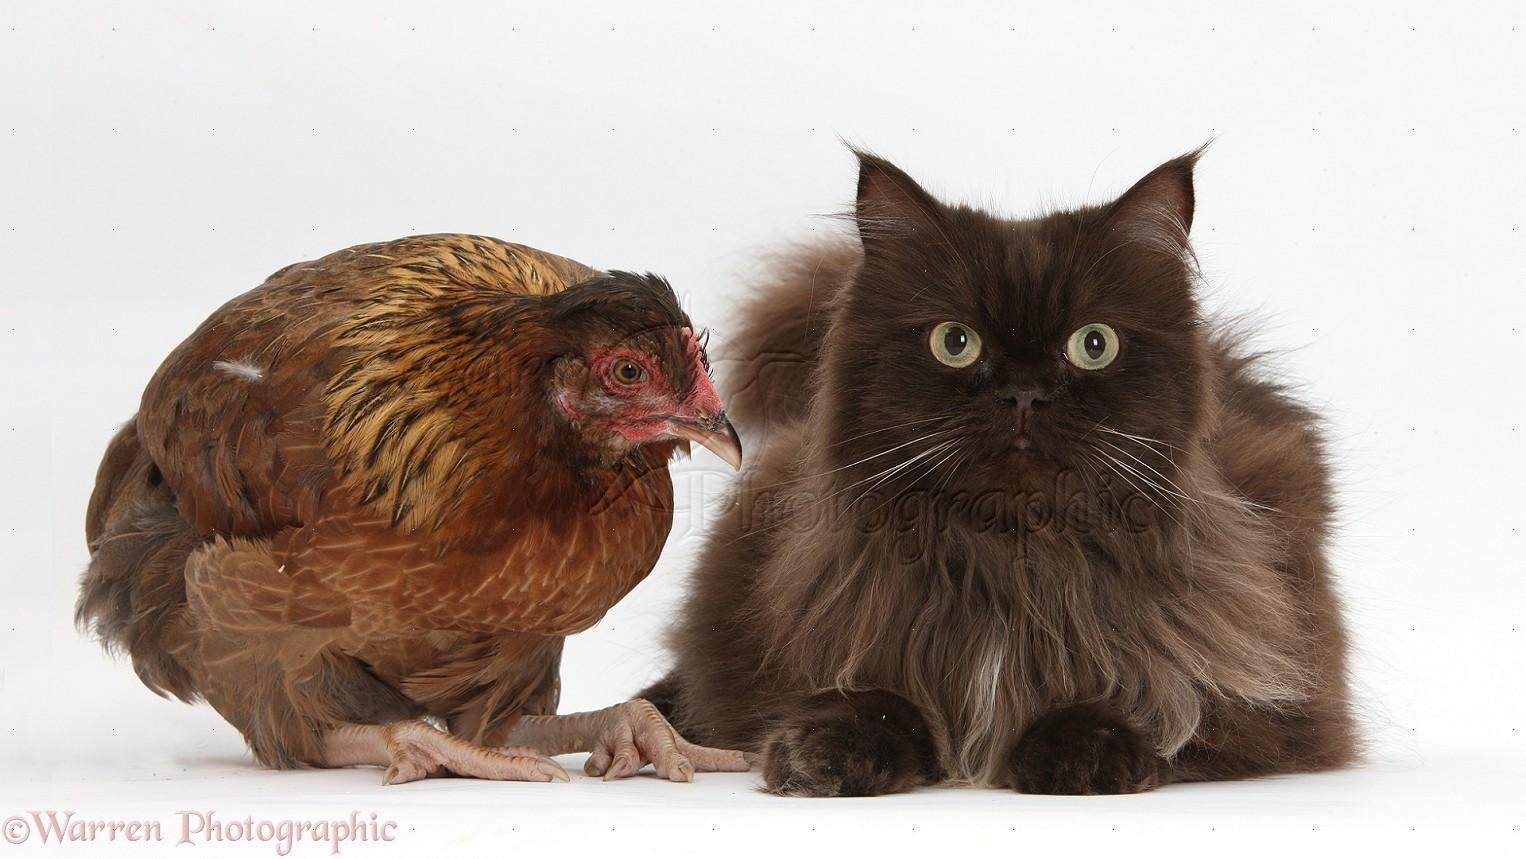 Cats & Kittens - Moggies, cross-breeds